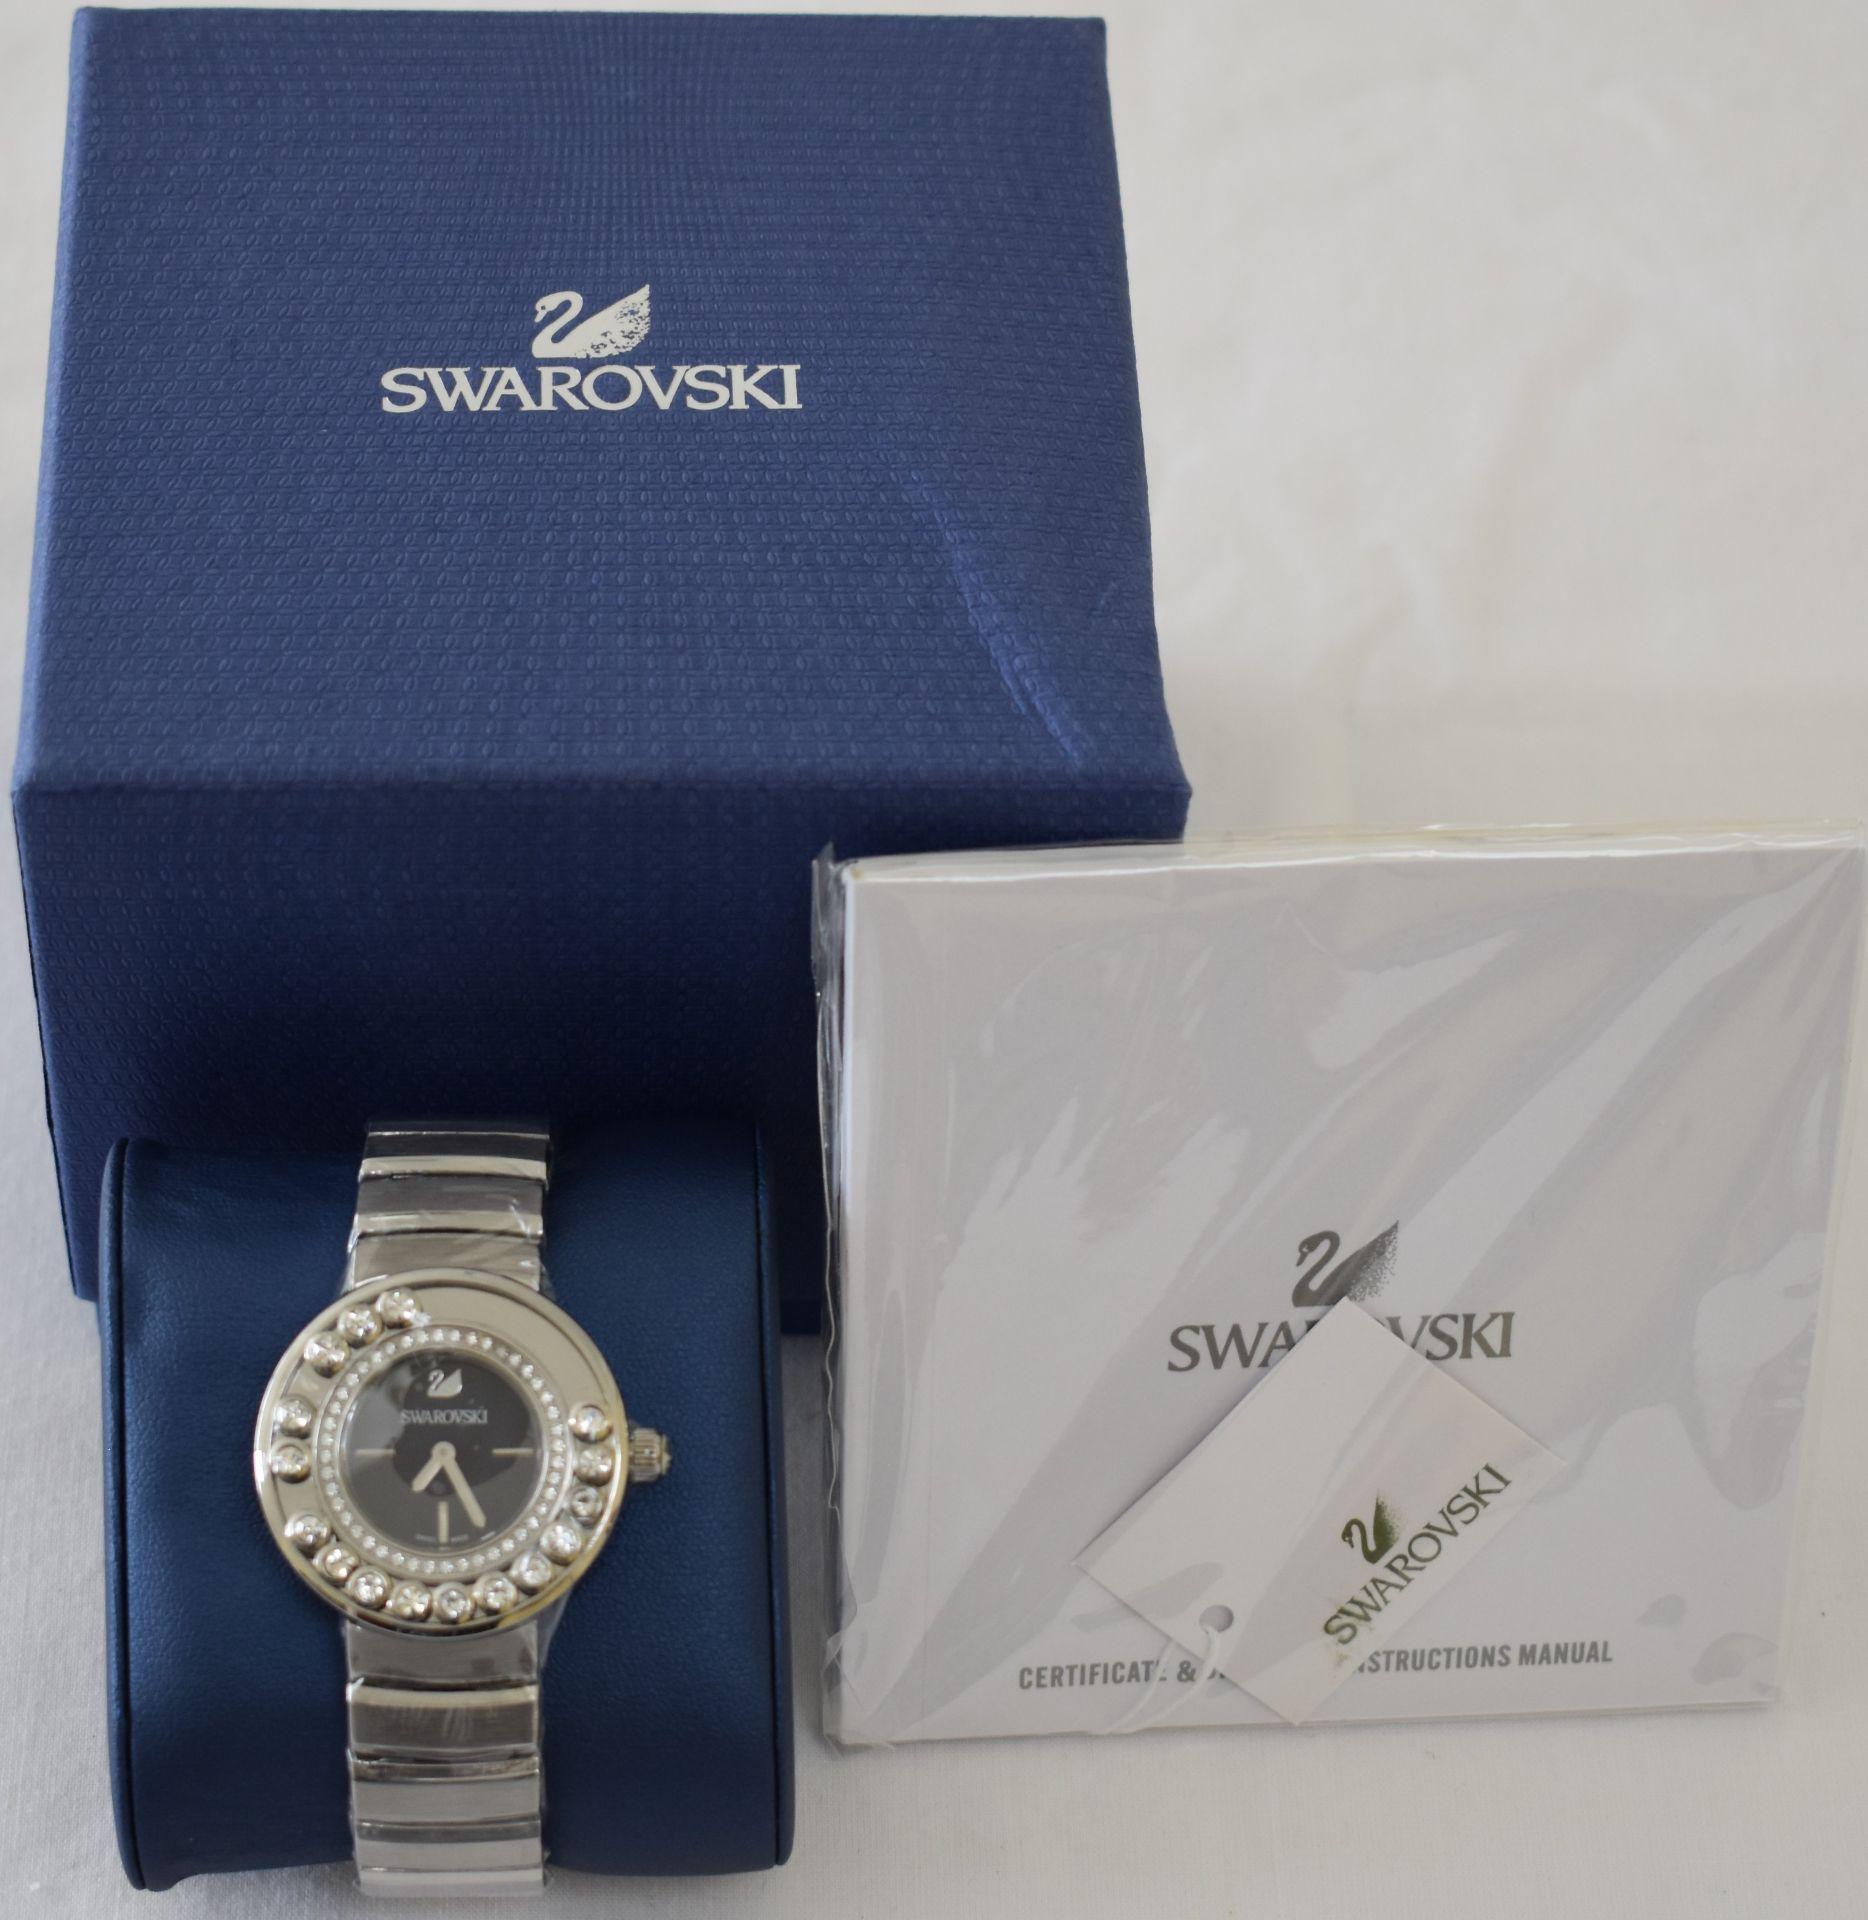 Swarovski 1160305 Ladies Watch